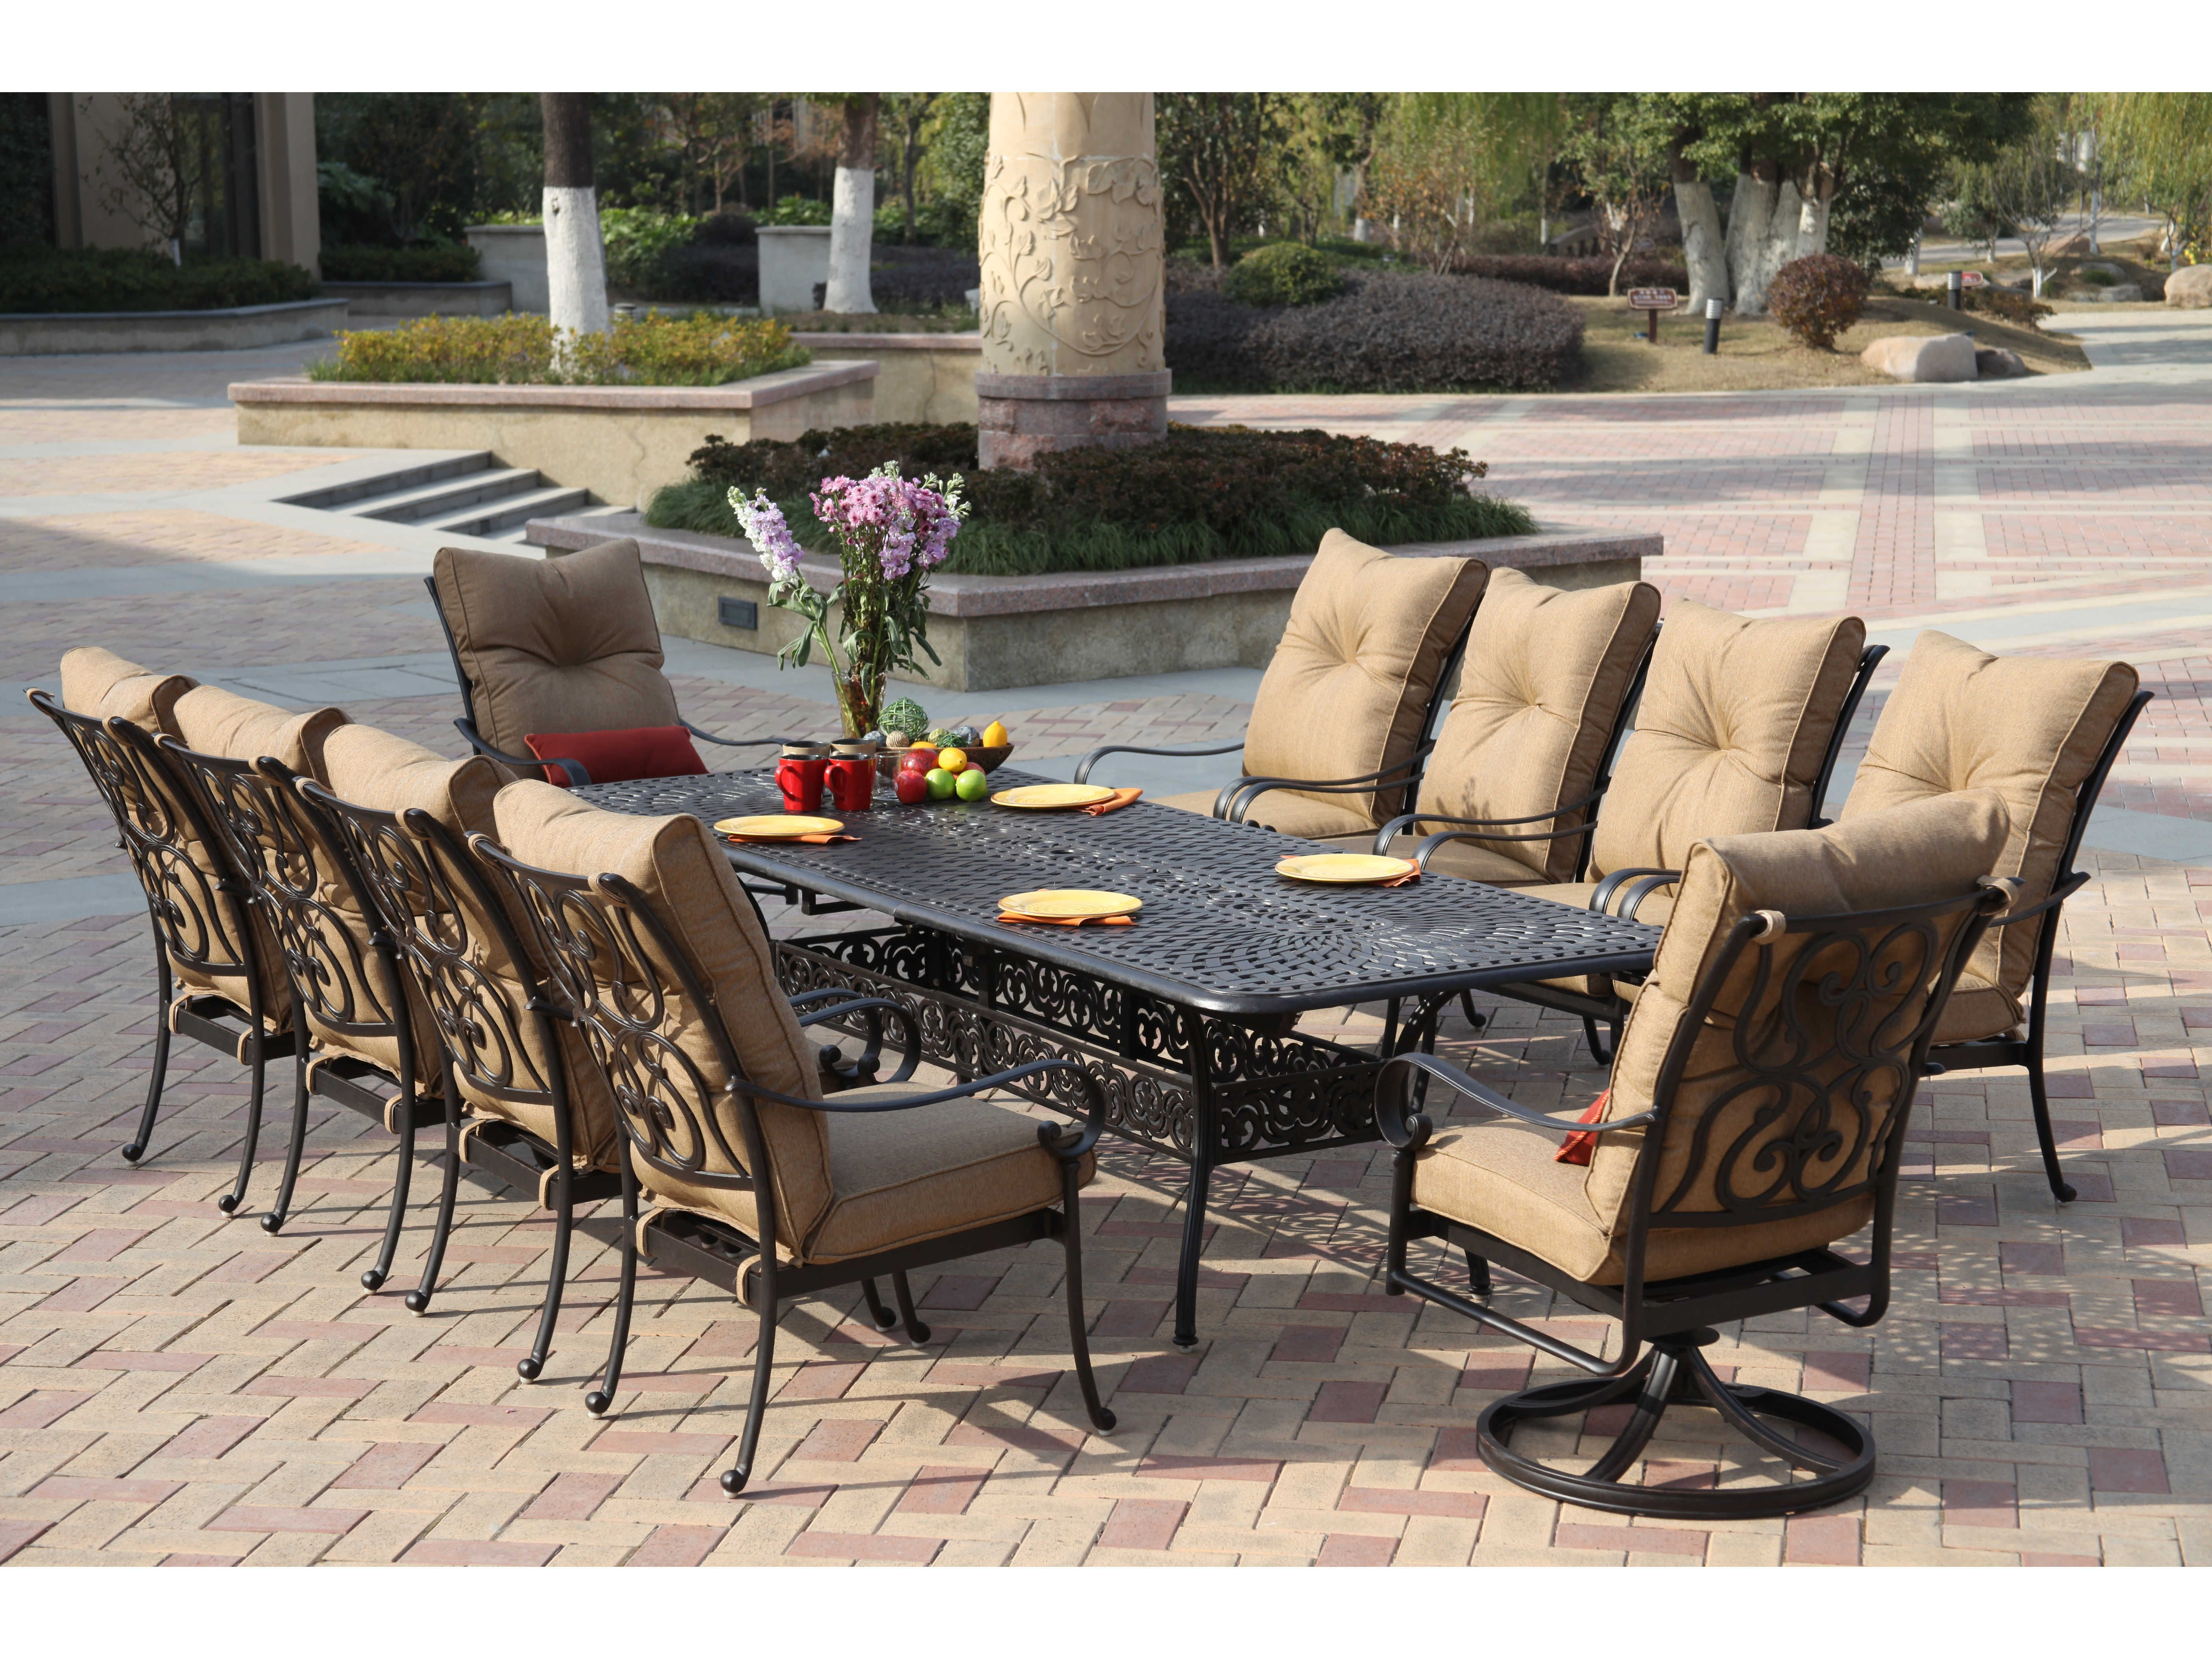 darlee outdoor living santa anita antique bronze cast aluminum dining set modern patio furniture patio furniture sets outdoor dining room